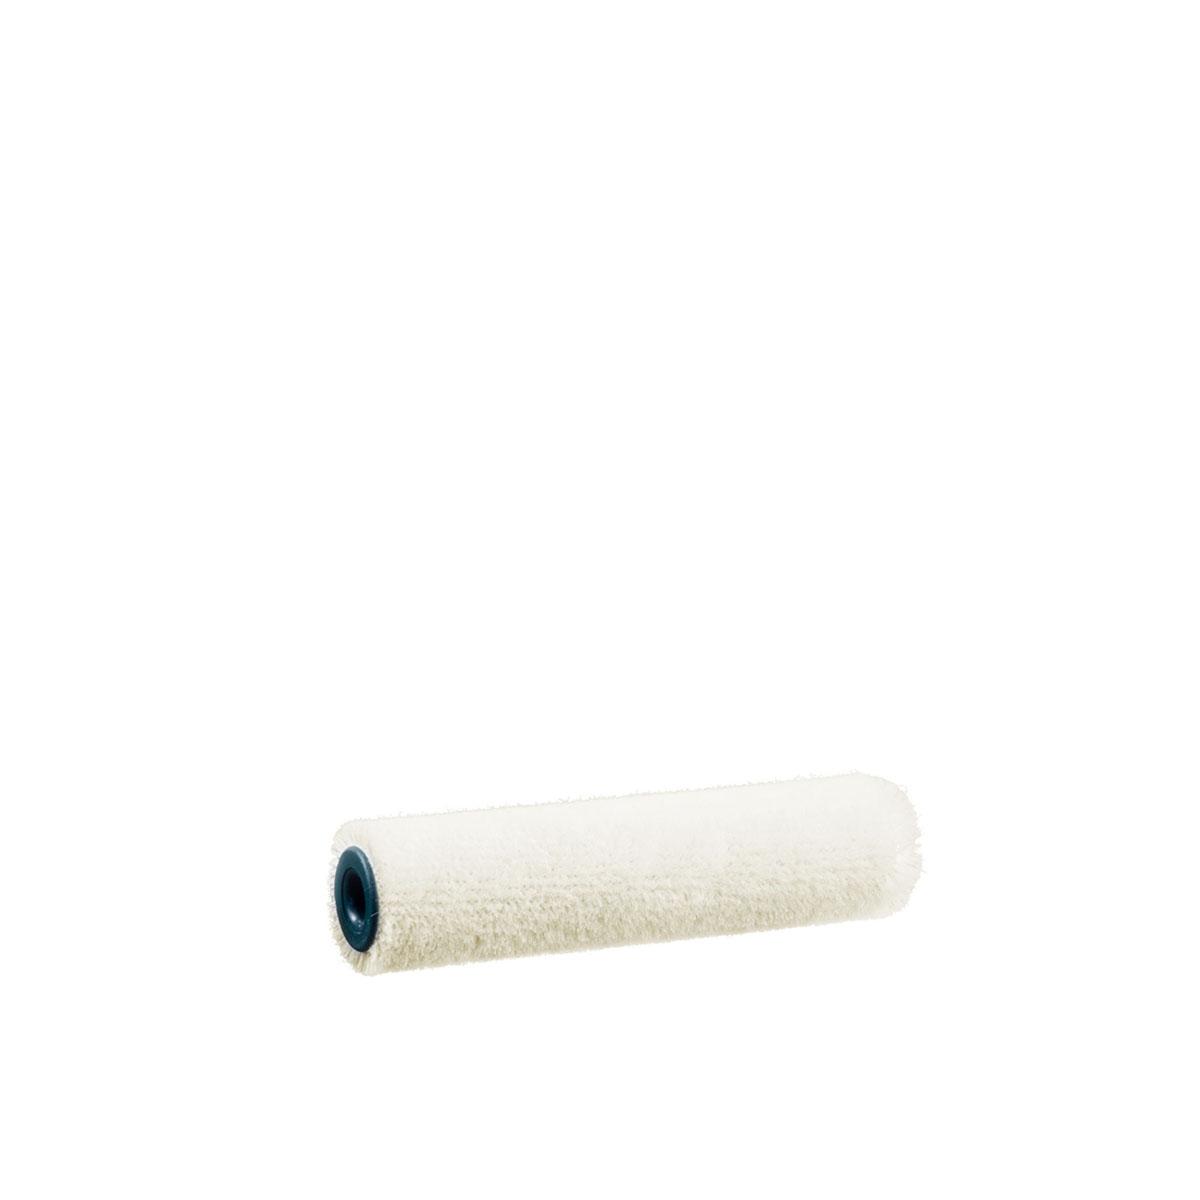 Rotaplast Velours Walze 10cm, 4mm Flor, 50530